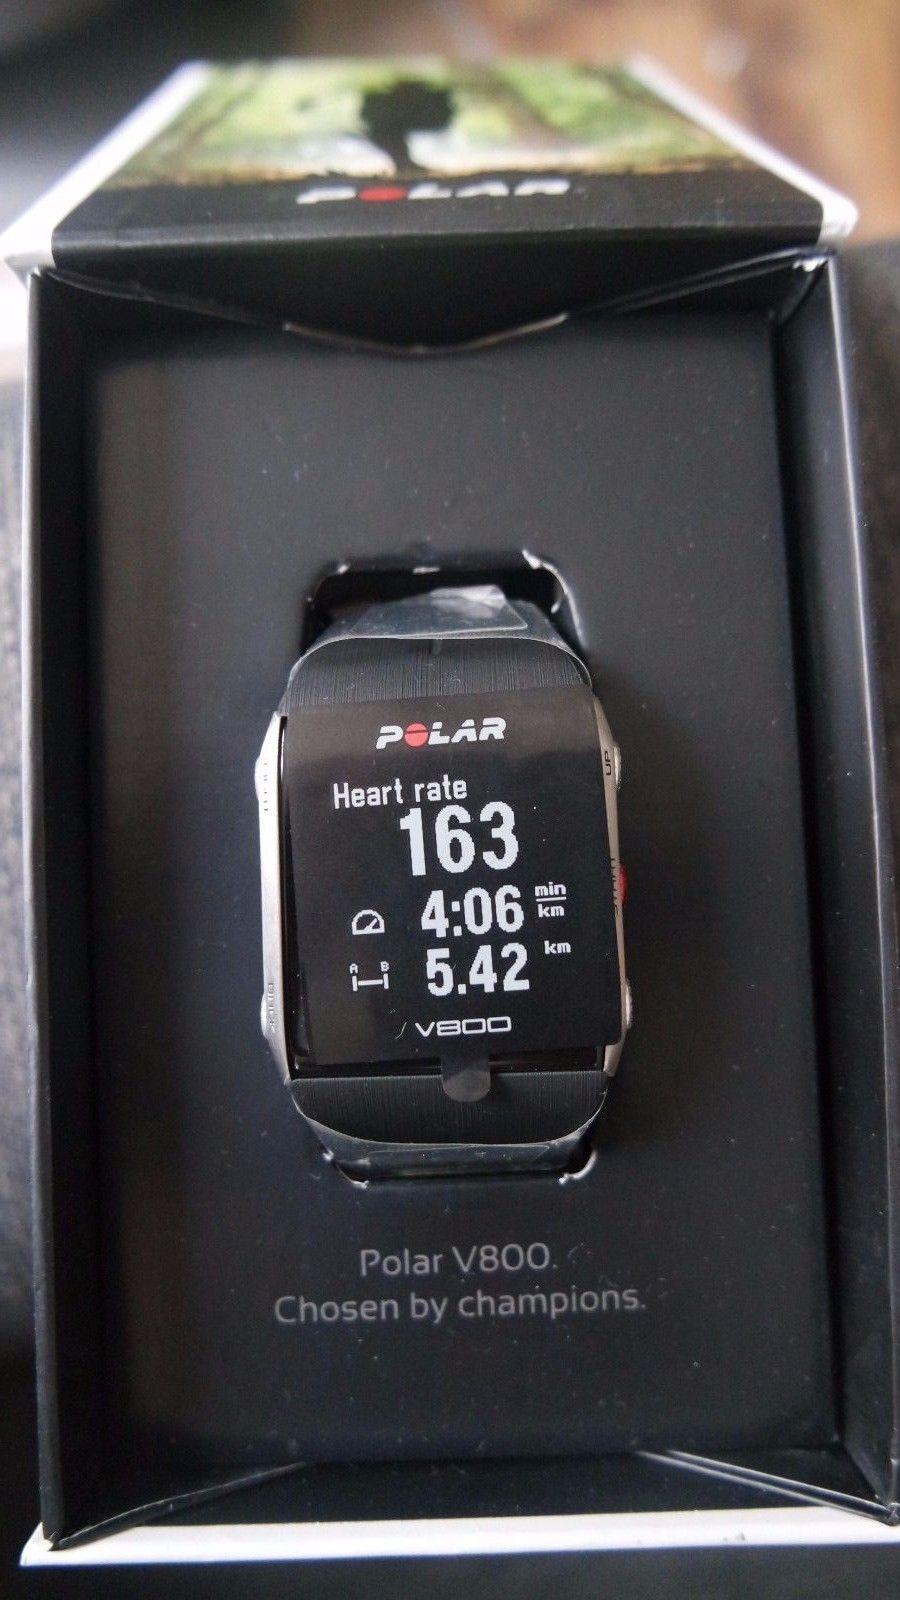 Polar V800 NEU Trainingcomputer GPS-Pulsuhr Bluetooth schwarz Aktivitätsmesser